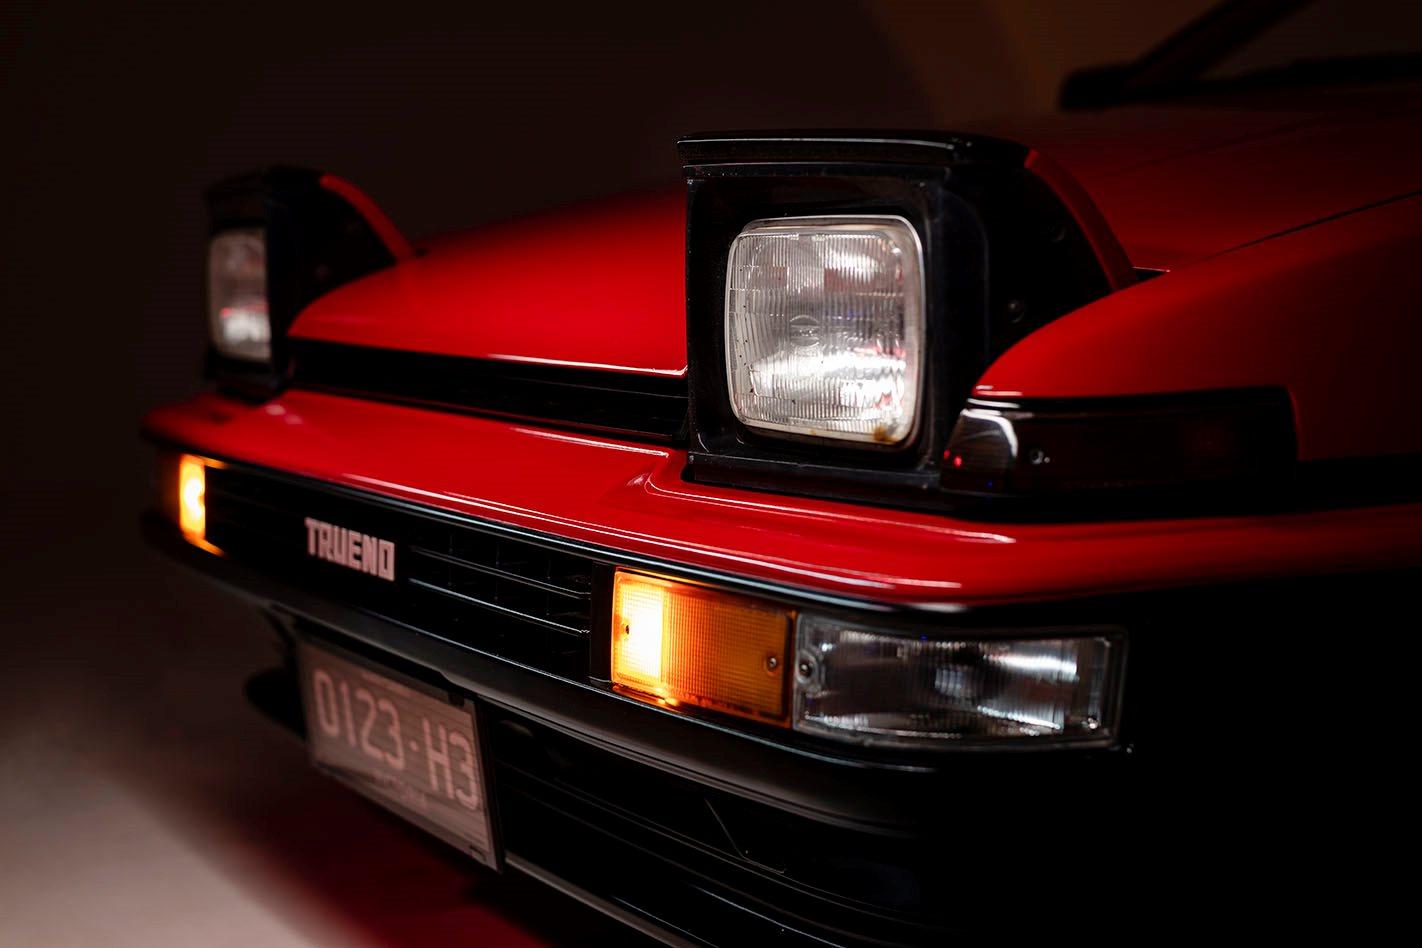 Toyota AE86 headlights